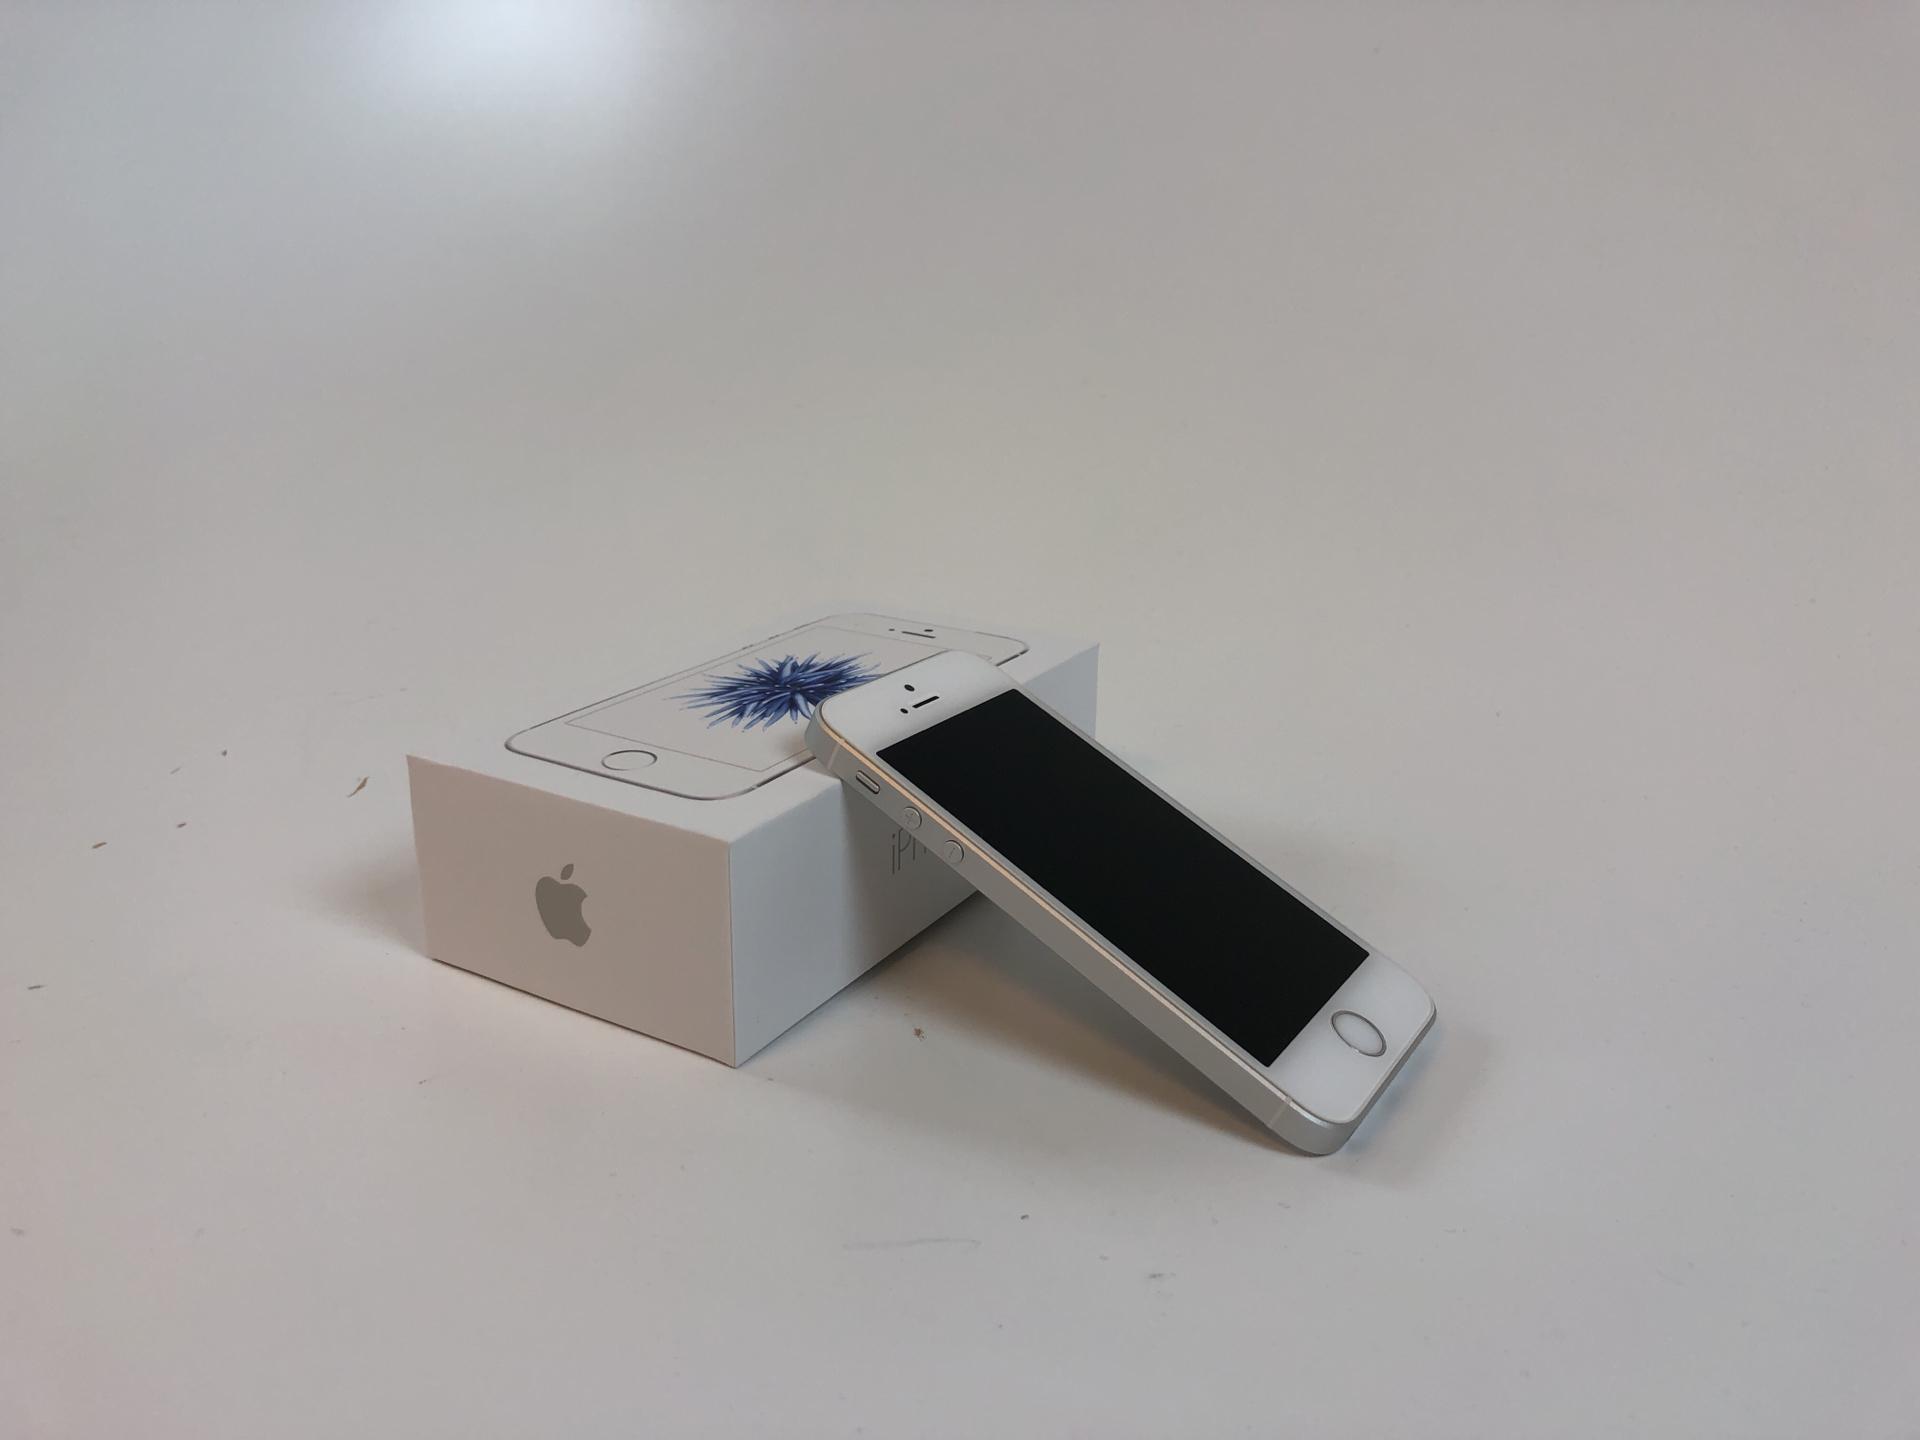 iPhone SE 32GB, 32GB, Silver, Afbeelding 1